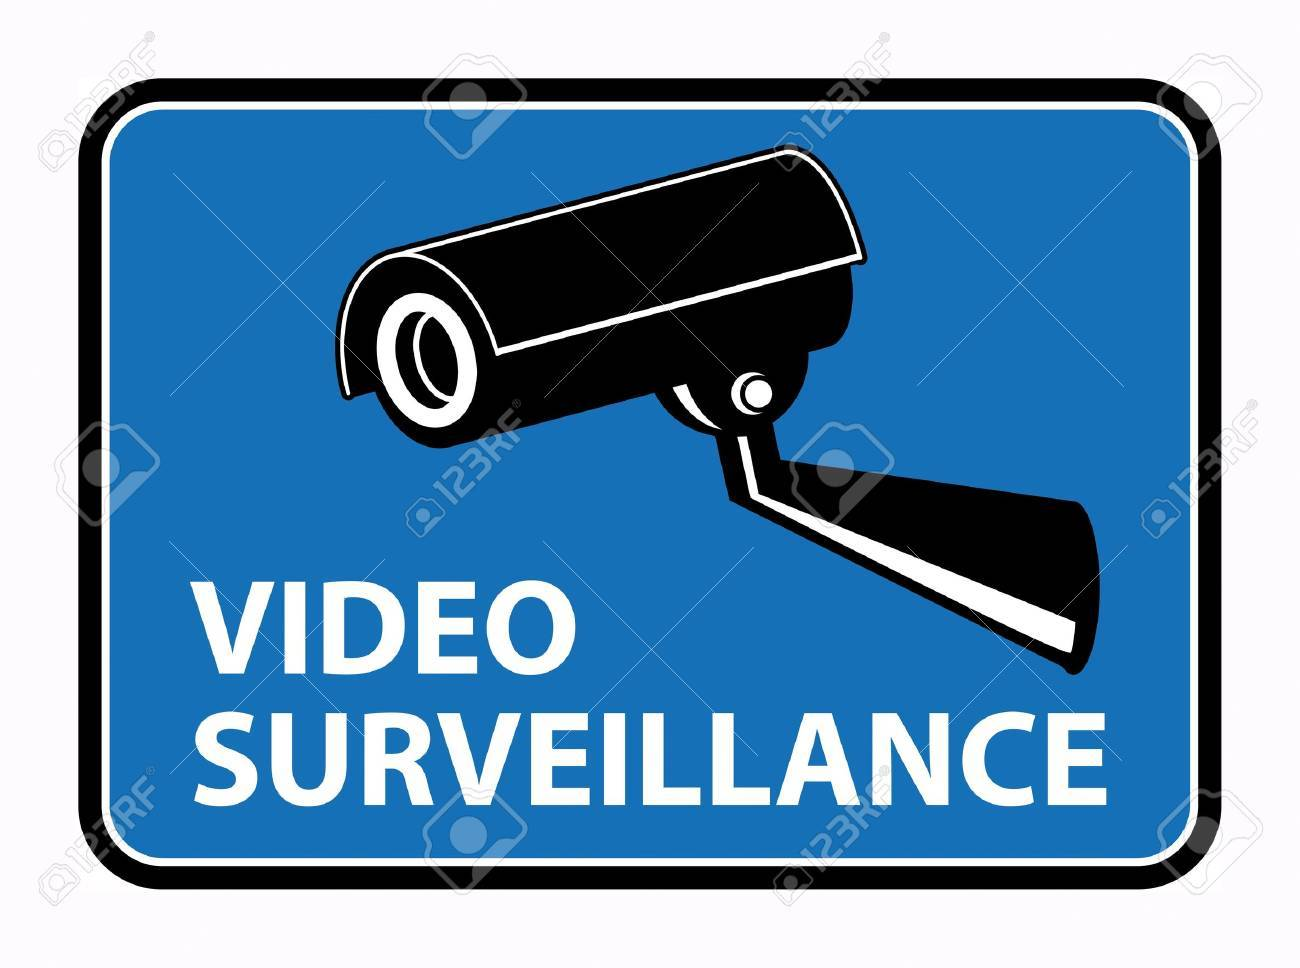 Video surveillance sign Stock Vector - 18246153